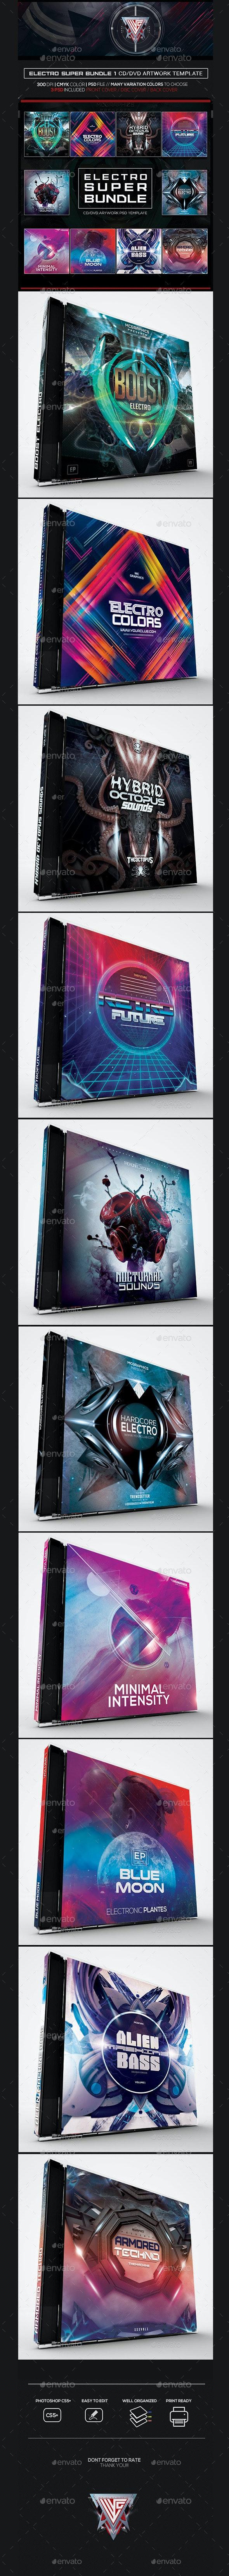 Electro Super Bundle Album Artworks CD/DVD Template Vol. 1 - CD & DVD Artwork Print Templates